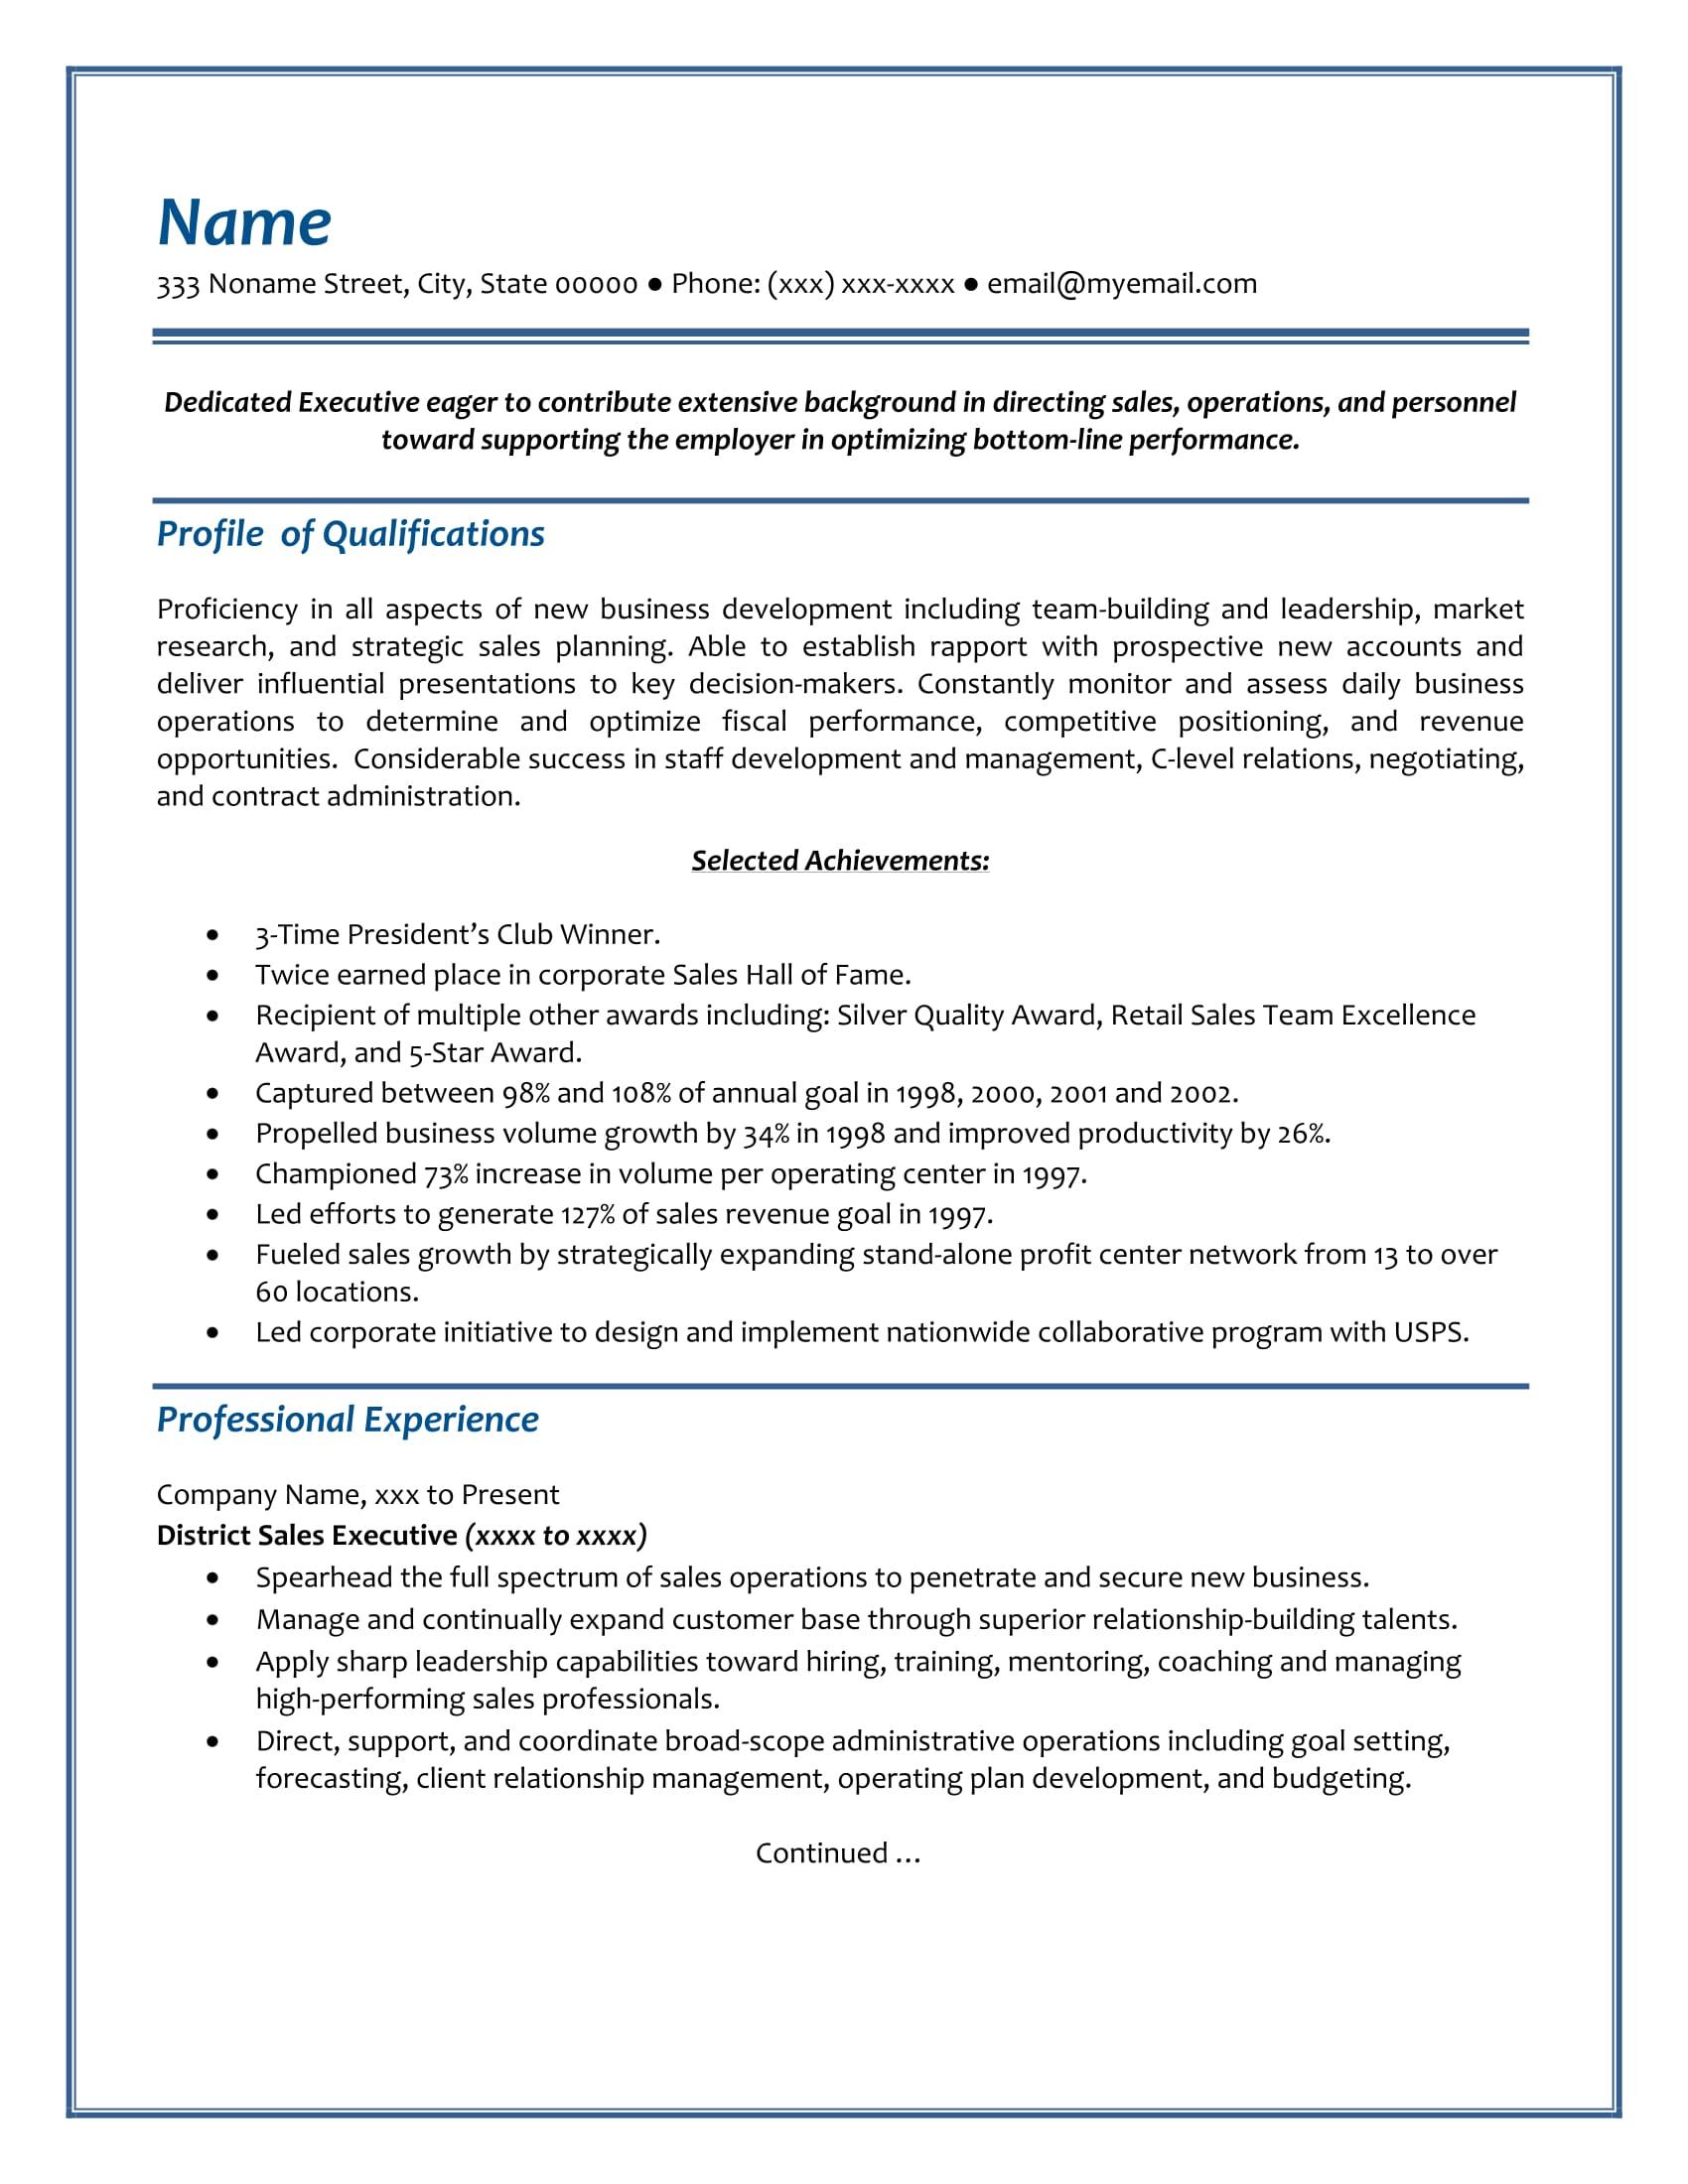 Executive Resume - Sample 2